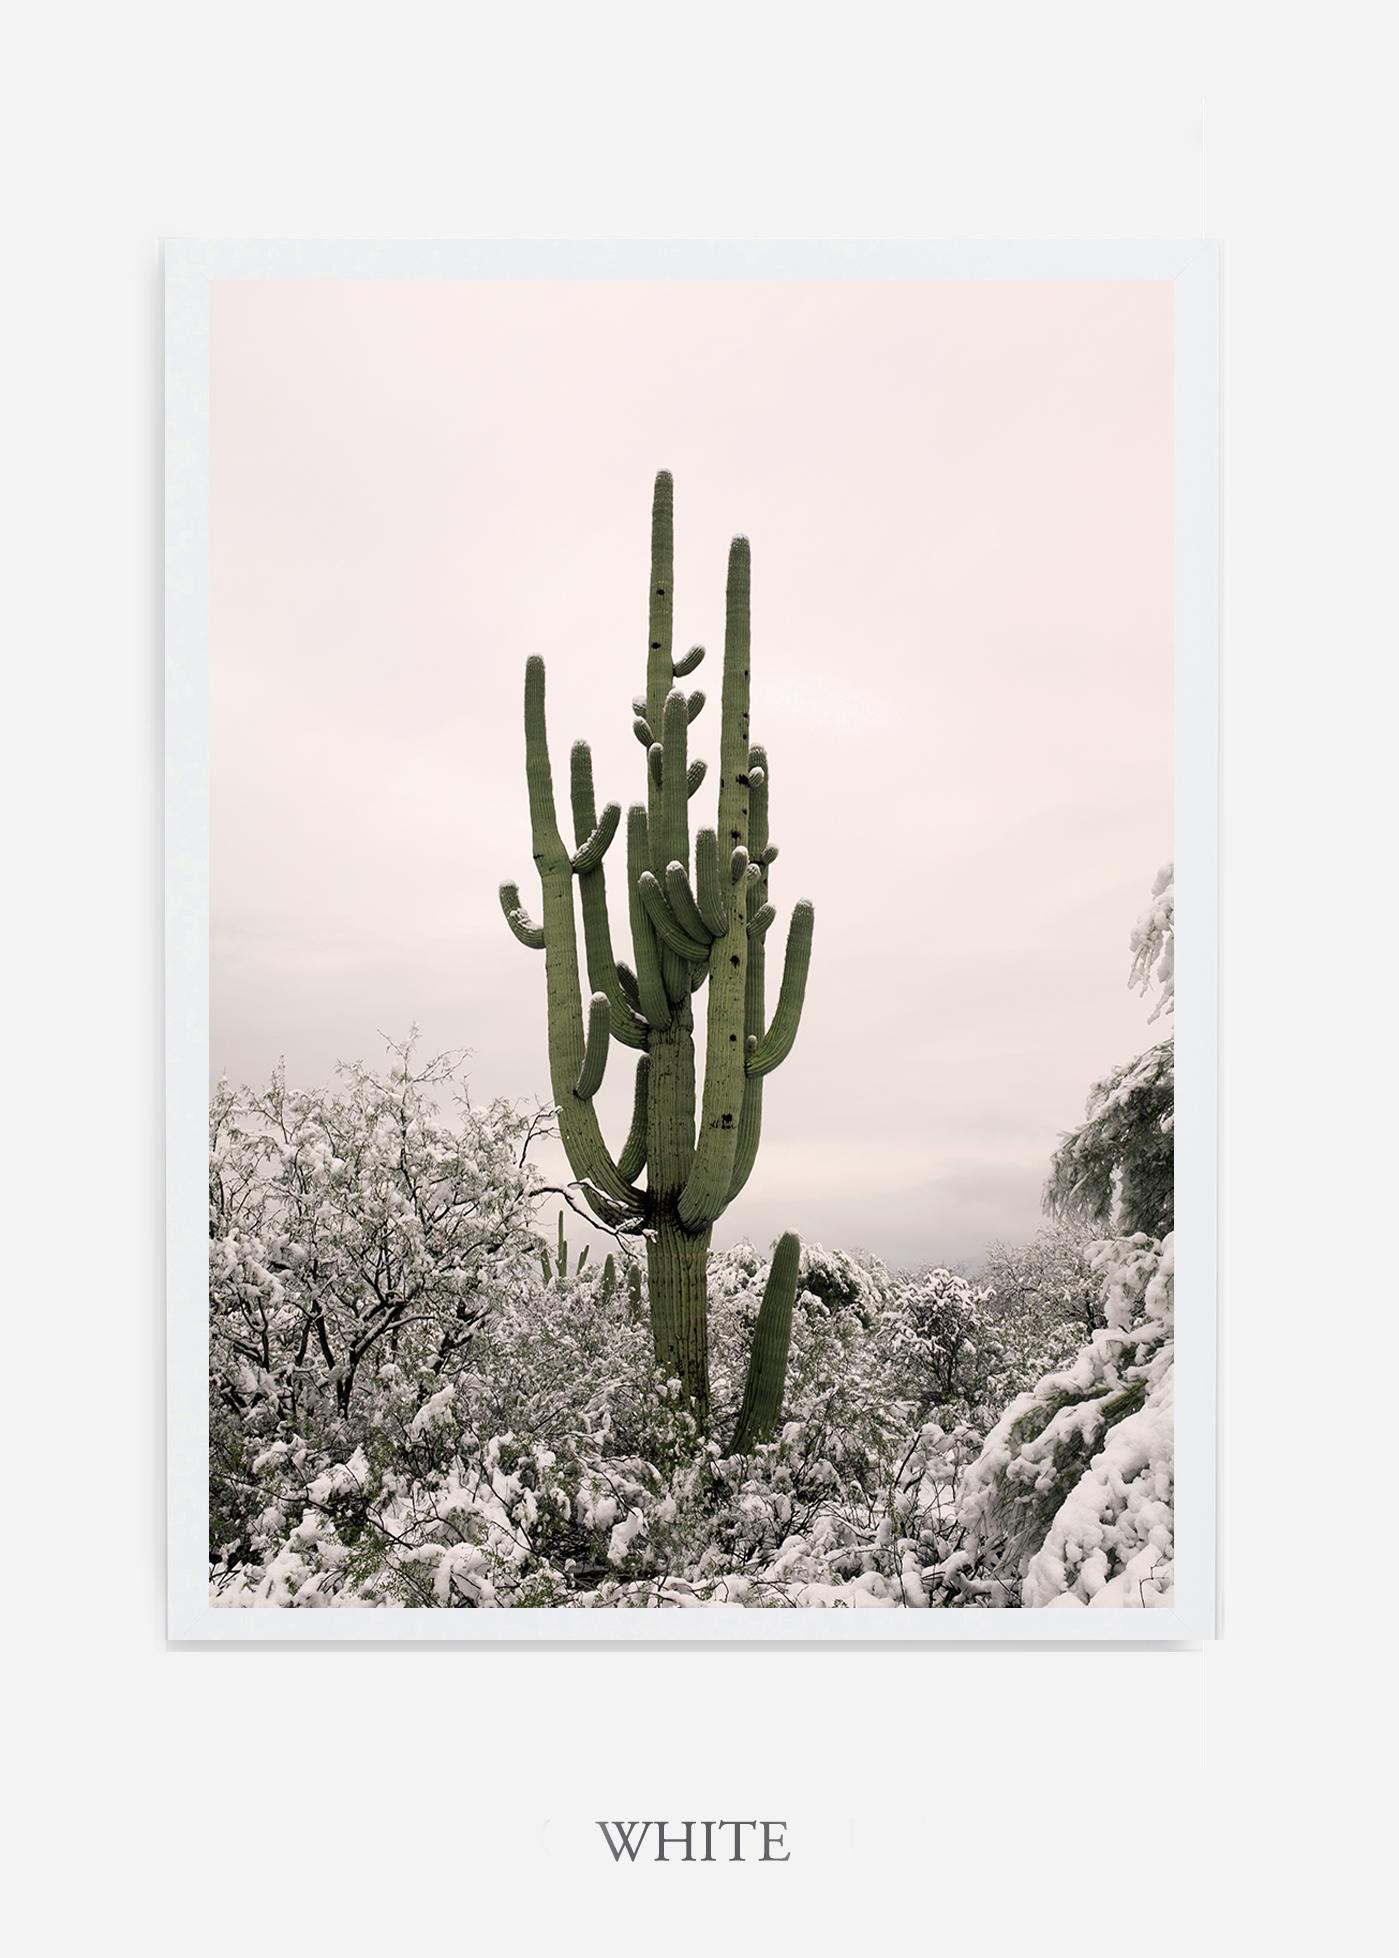 nomat-whiteframe-saguaroNo.8-wildercalifornia-art-wallart-cactusprint-homedecor-prints-arizona-botanical-artwork-interiordesign.jpg